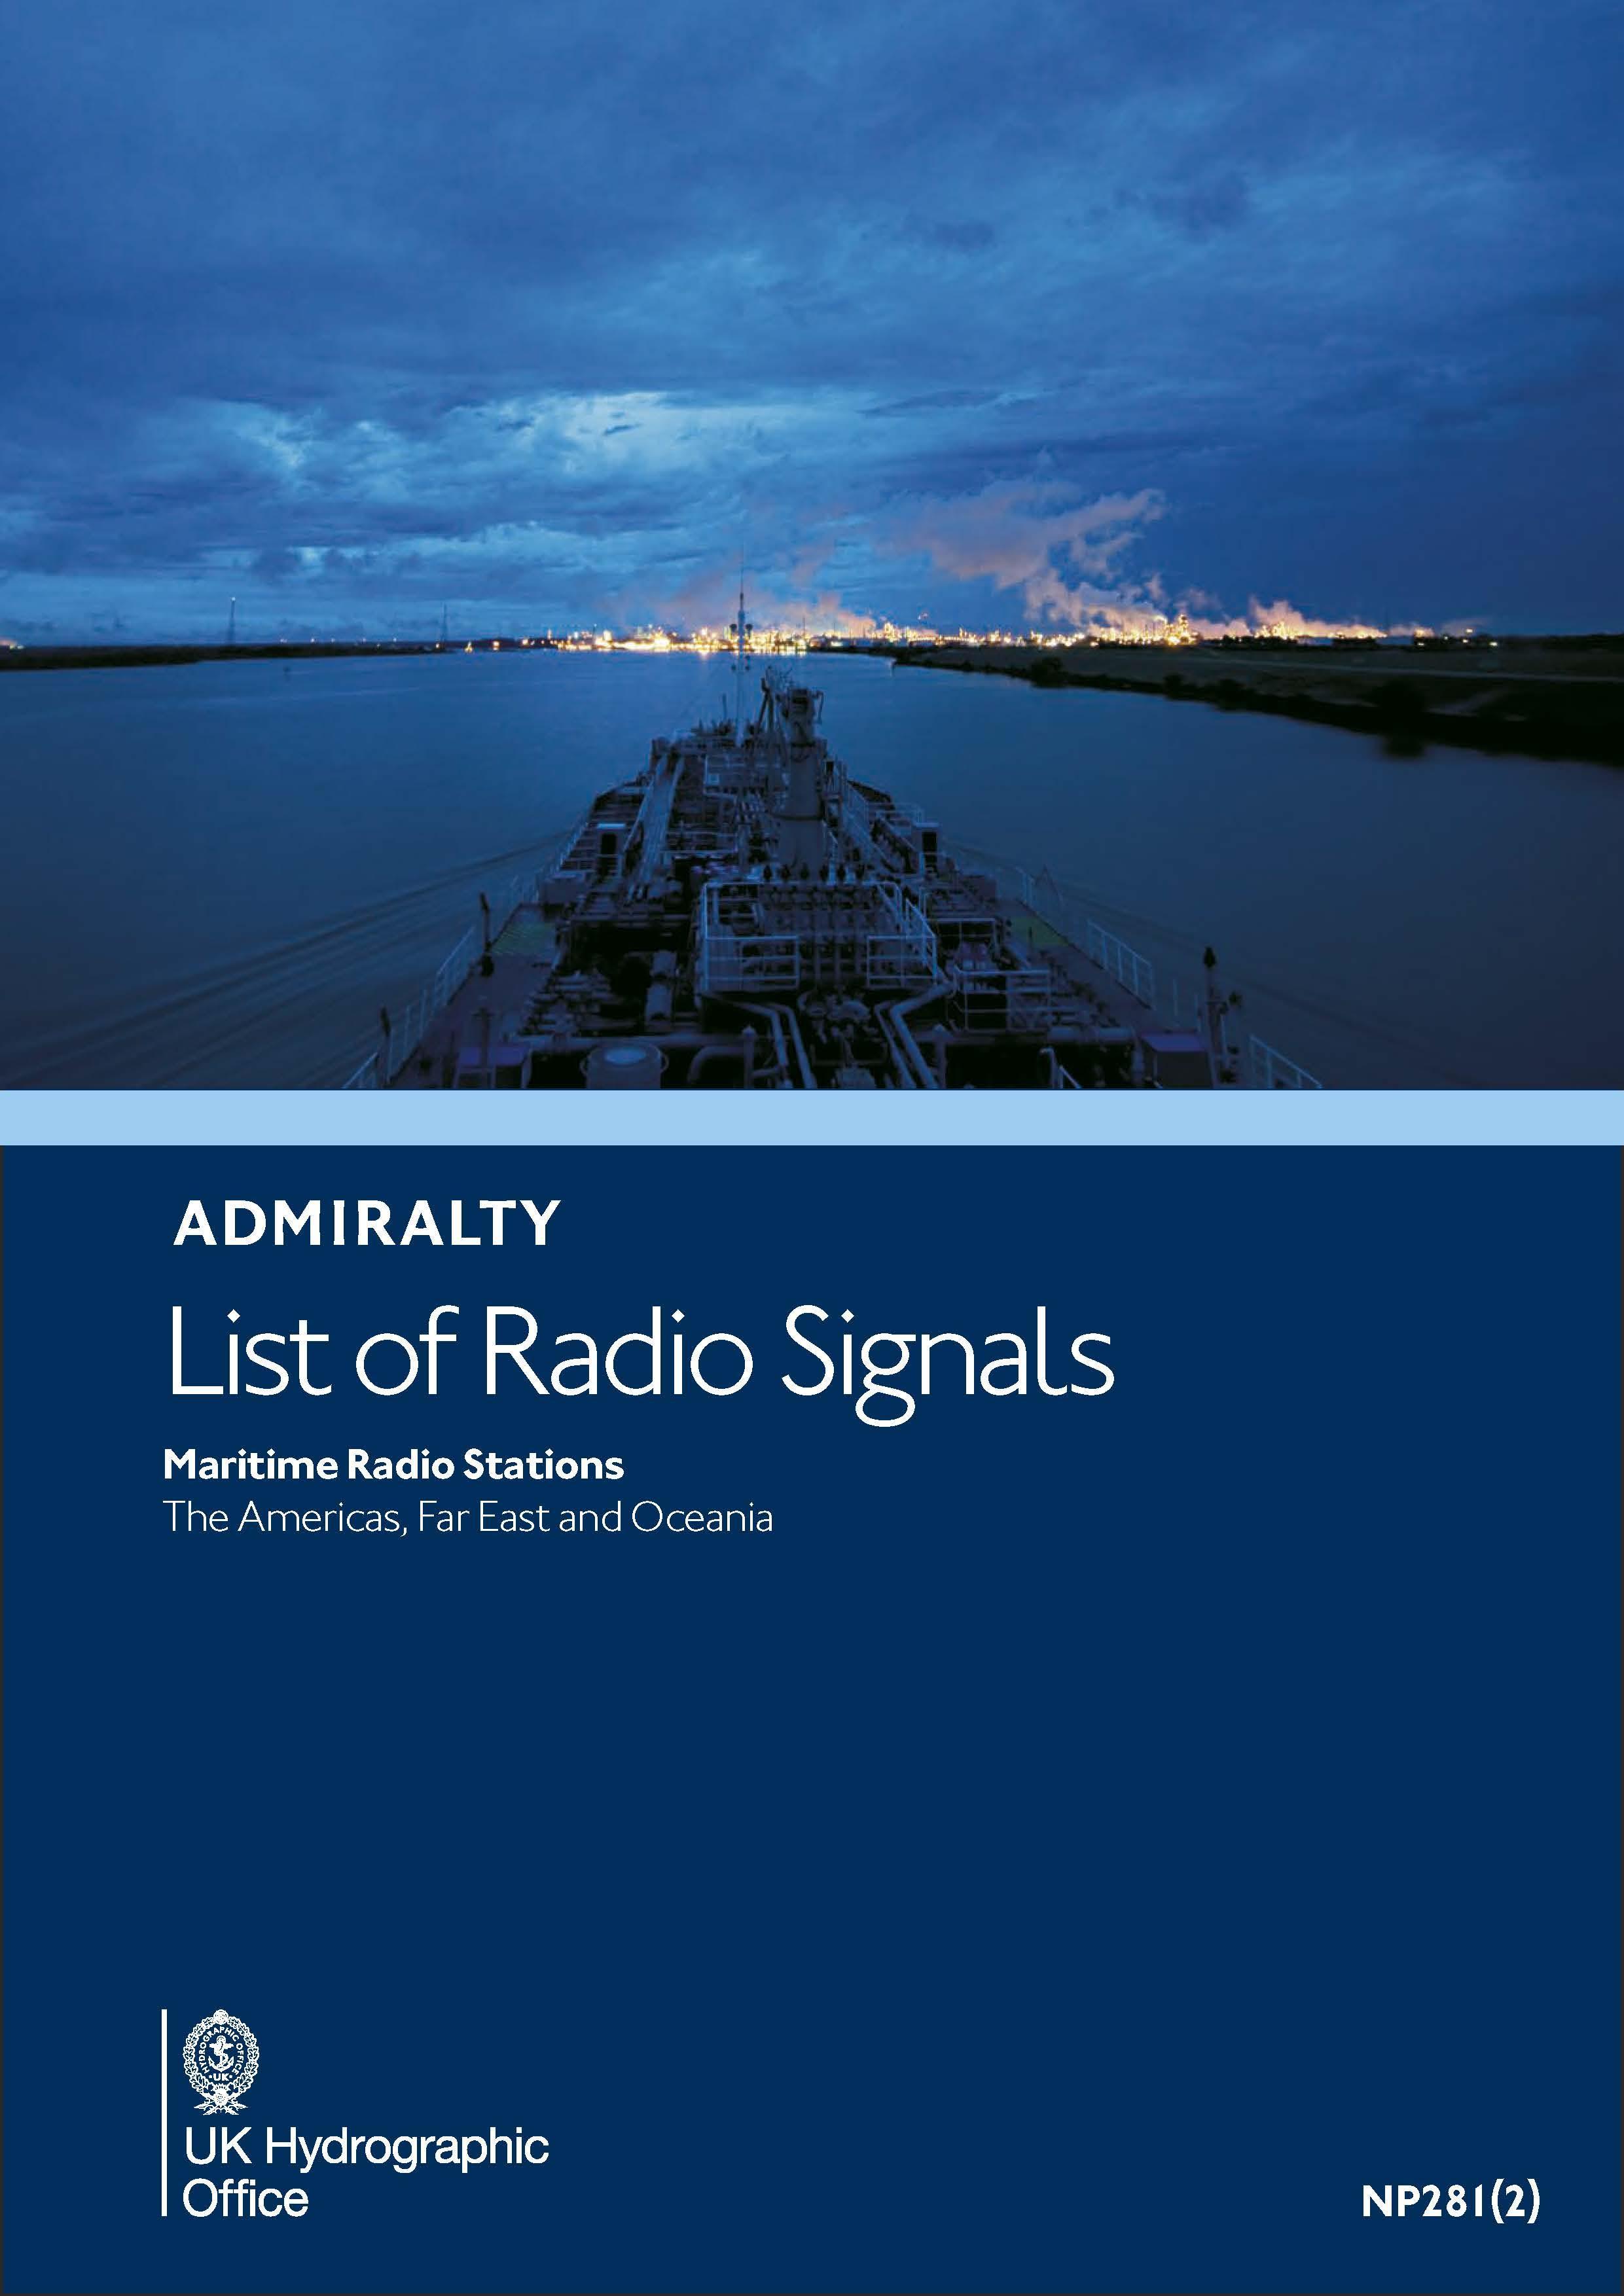 ADMIRALTY NP281(2) RadioSignals - Maritime Radio Stations - APAC